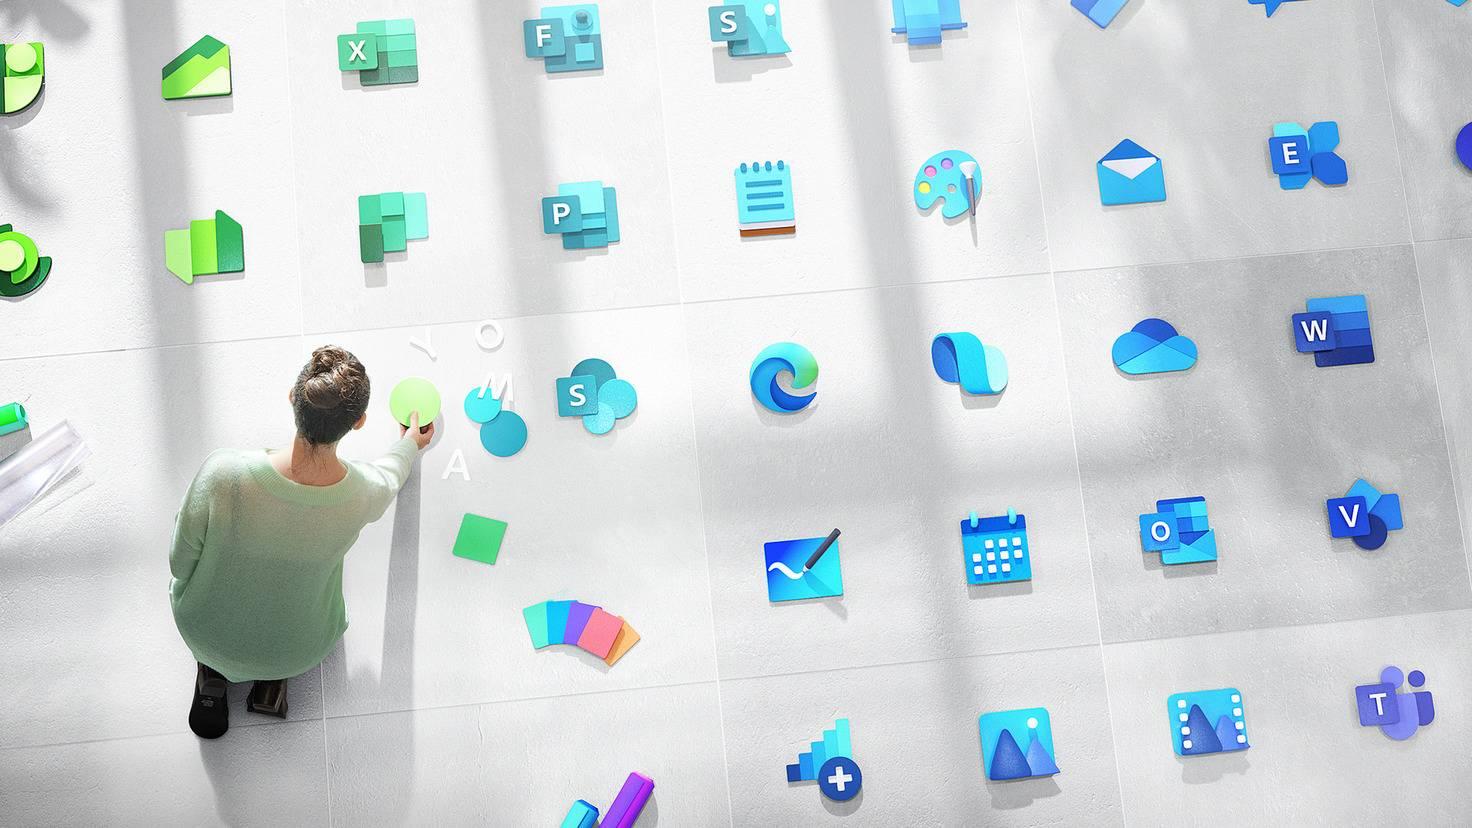 microsoft-fluent-design-2019